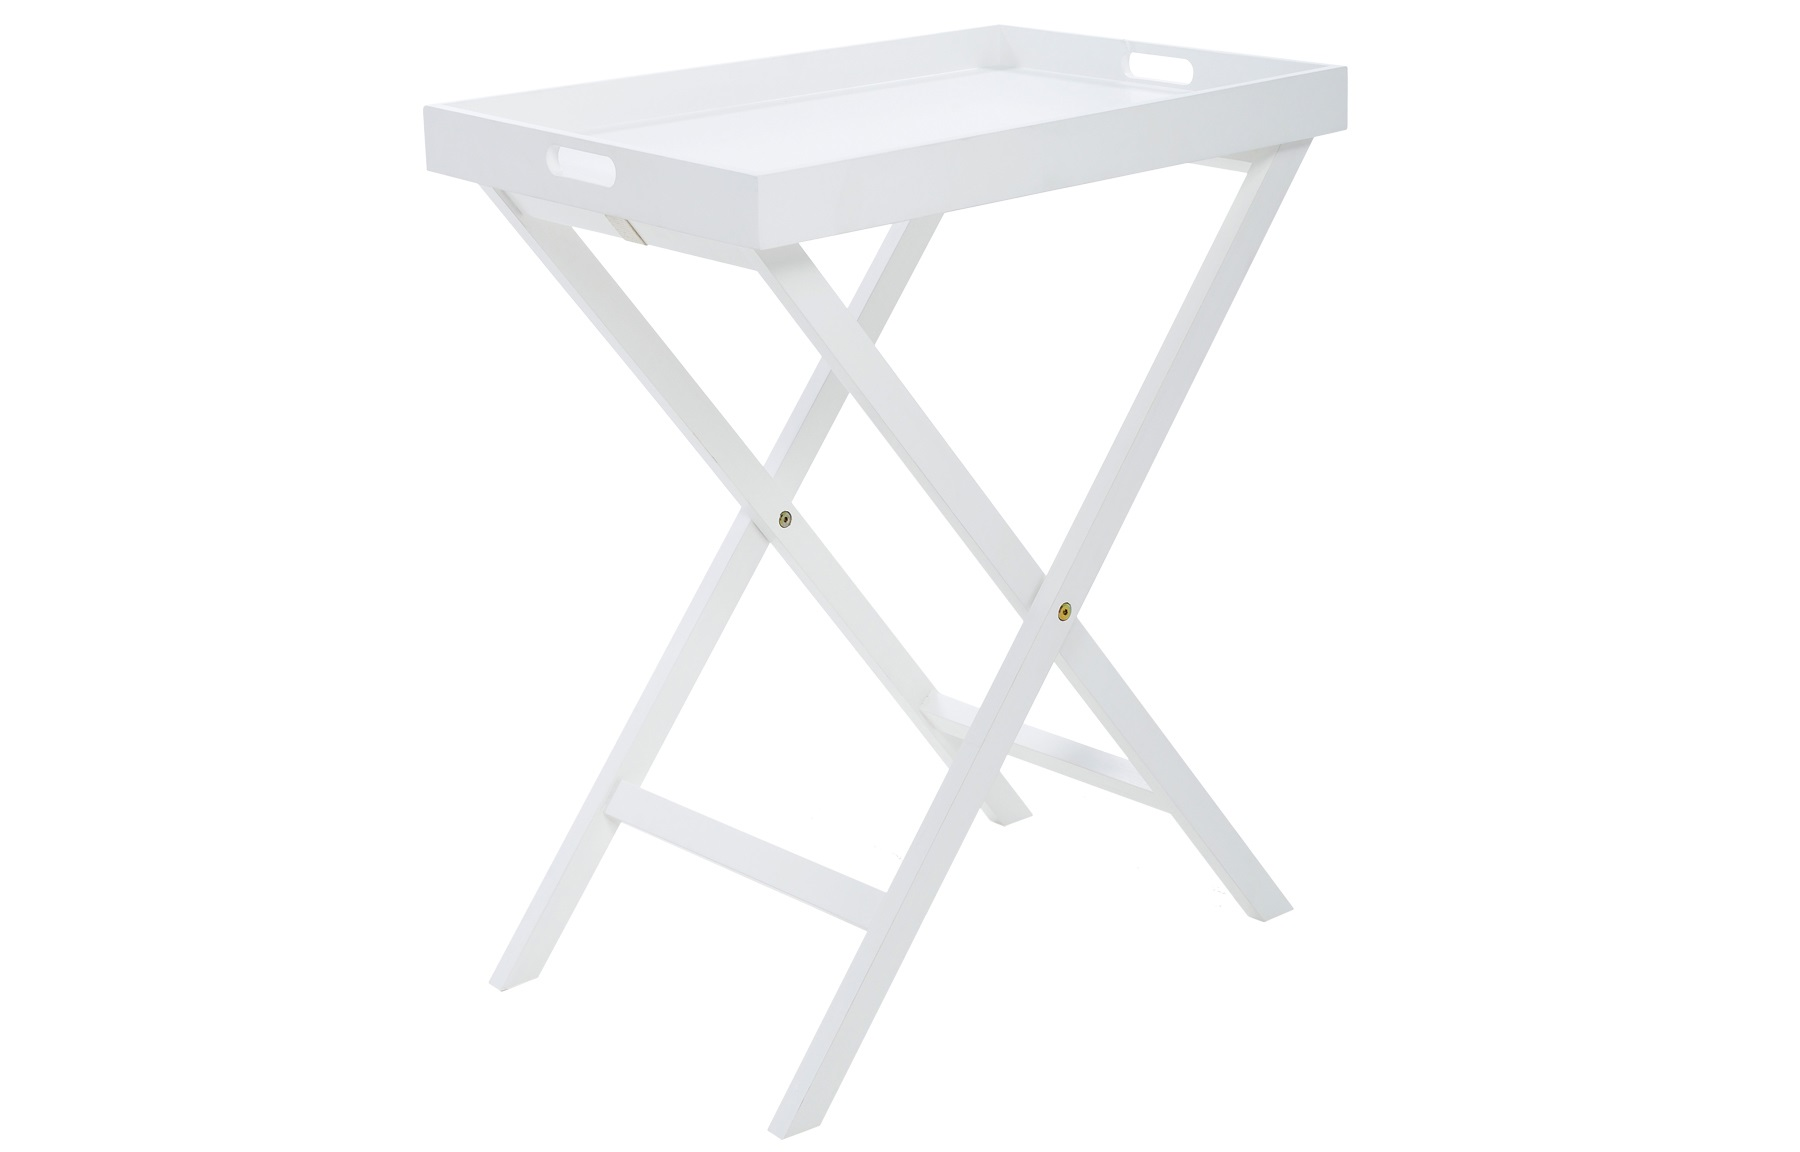 Стол-поднос ArtivaСтолы и столики для сада<br><br><br>Material: Сосна<br>Width см: 60<br>Depth см: 40<br>Height см: 70